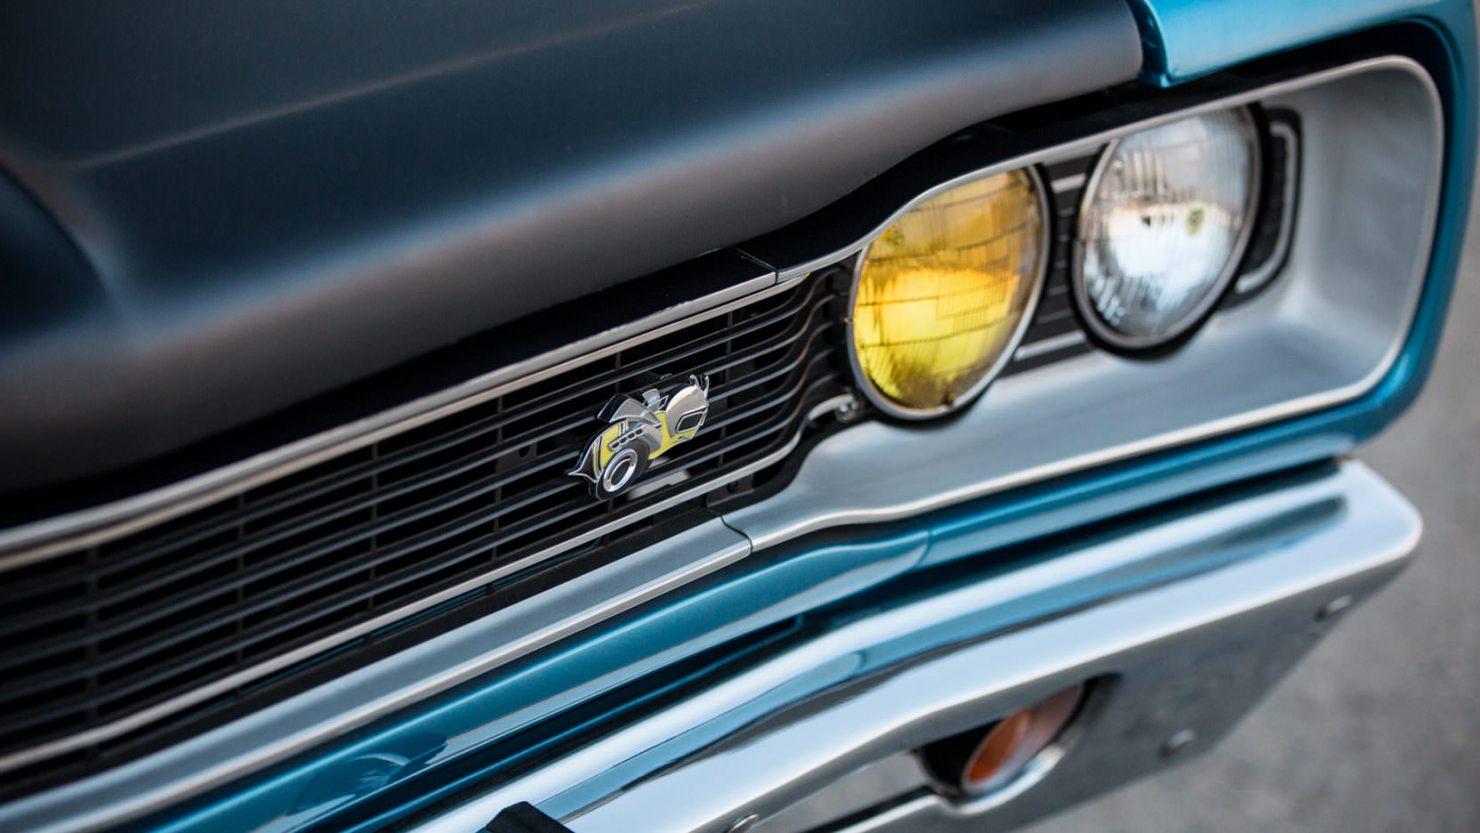 Dodge Super Bee 4 1480x833 - 1969 Dodge Super Bee 440 Six Pack